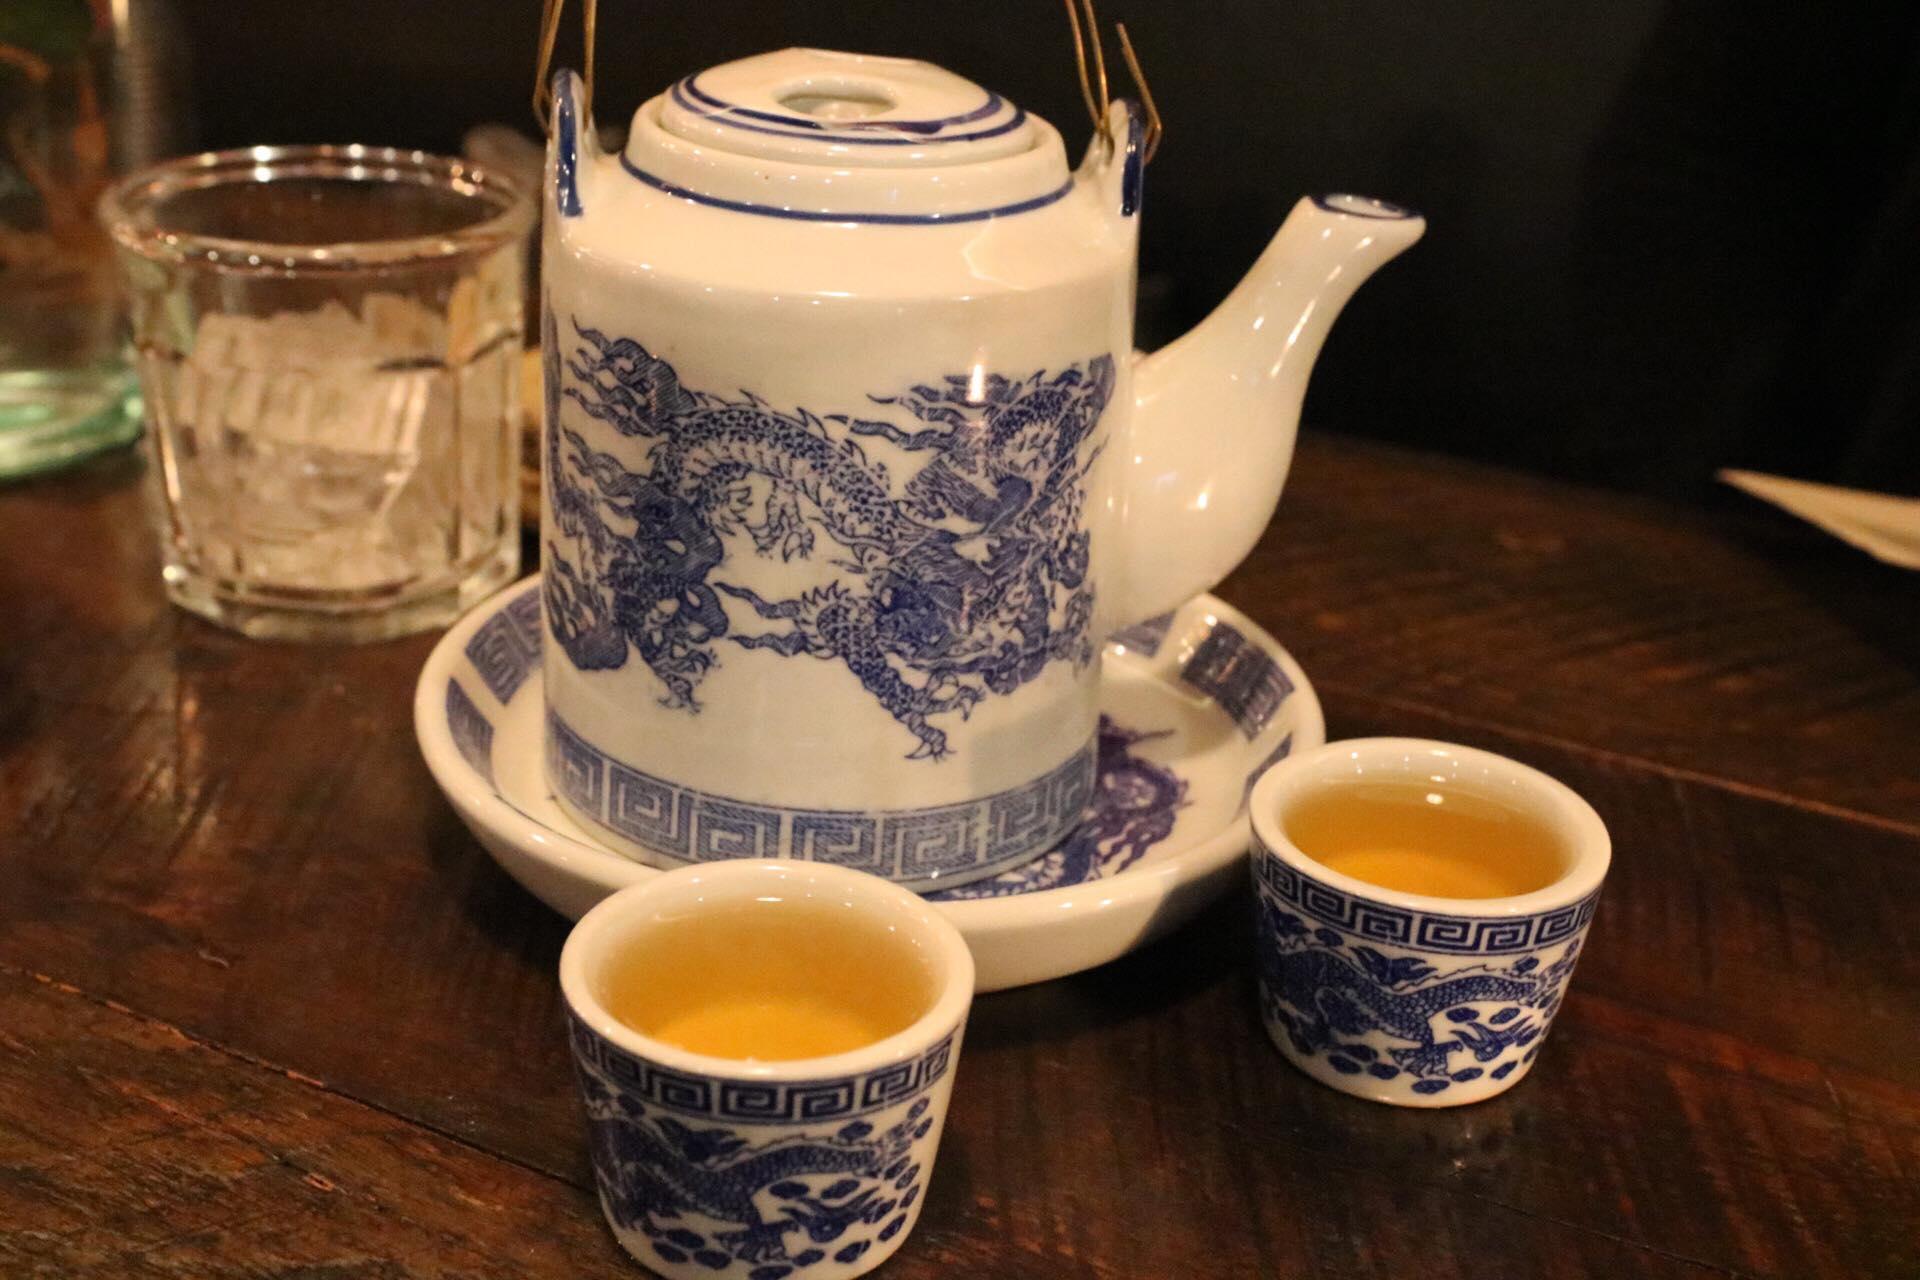 KT tea.jpg